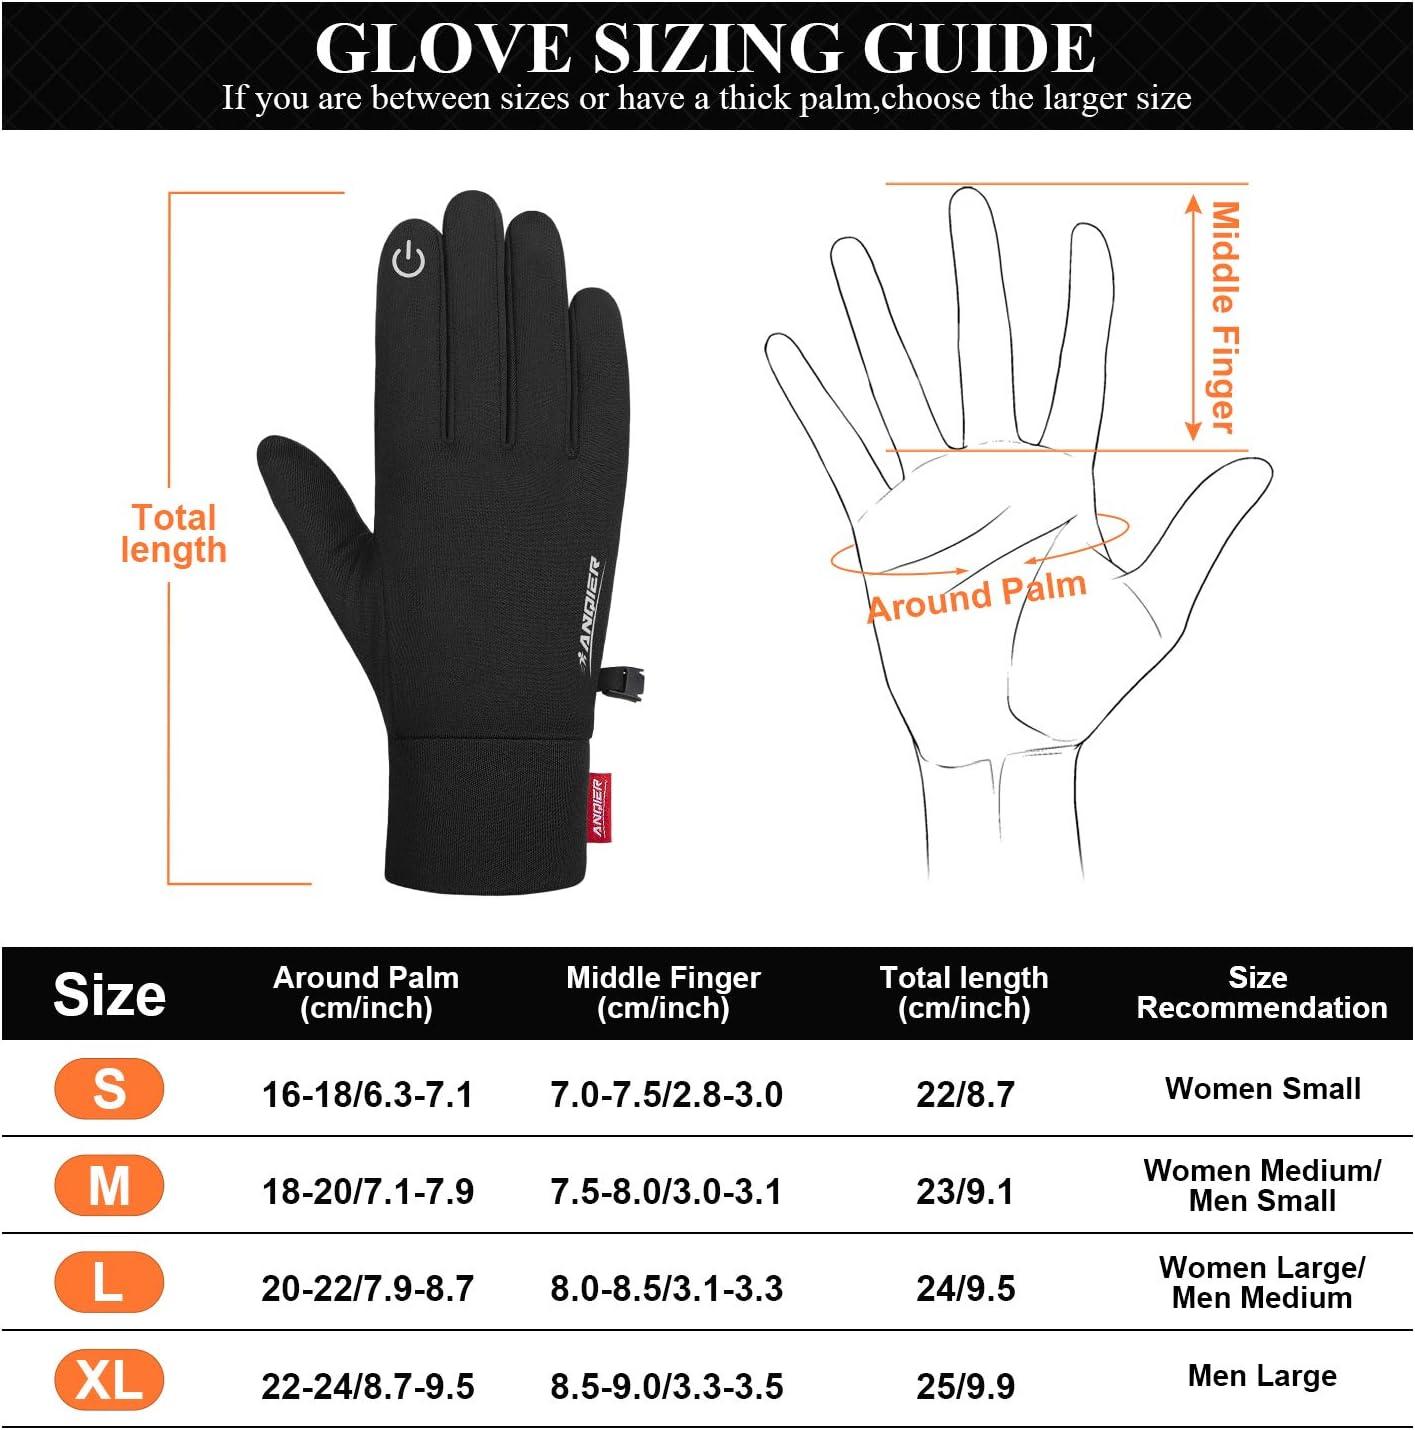 coskefy Winter Gloves Touchscreen Running Gloves Anti-slip Thermal Gloves Warm Liner Gloves Phone Gloves Men Women for Sports Cycling Hiking Walking Riding Bike